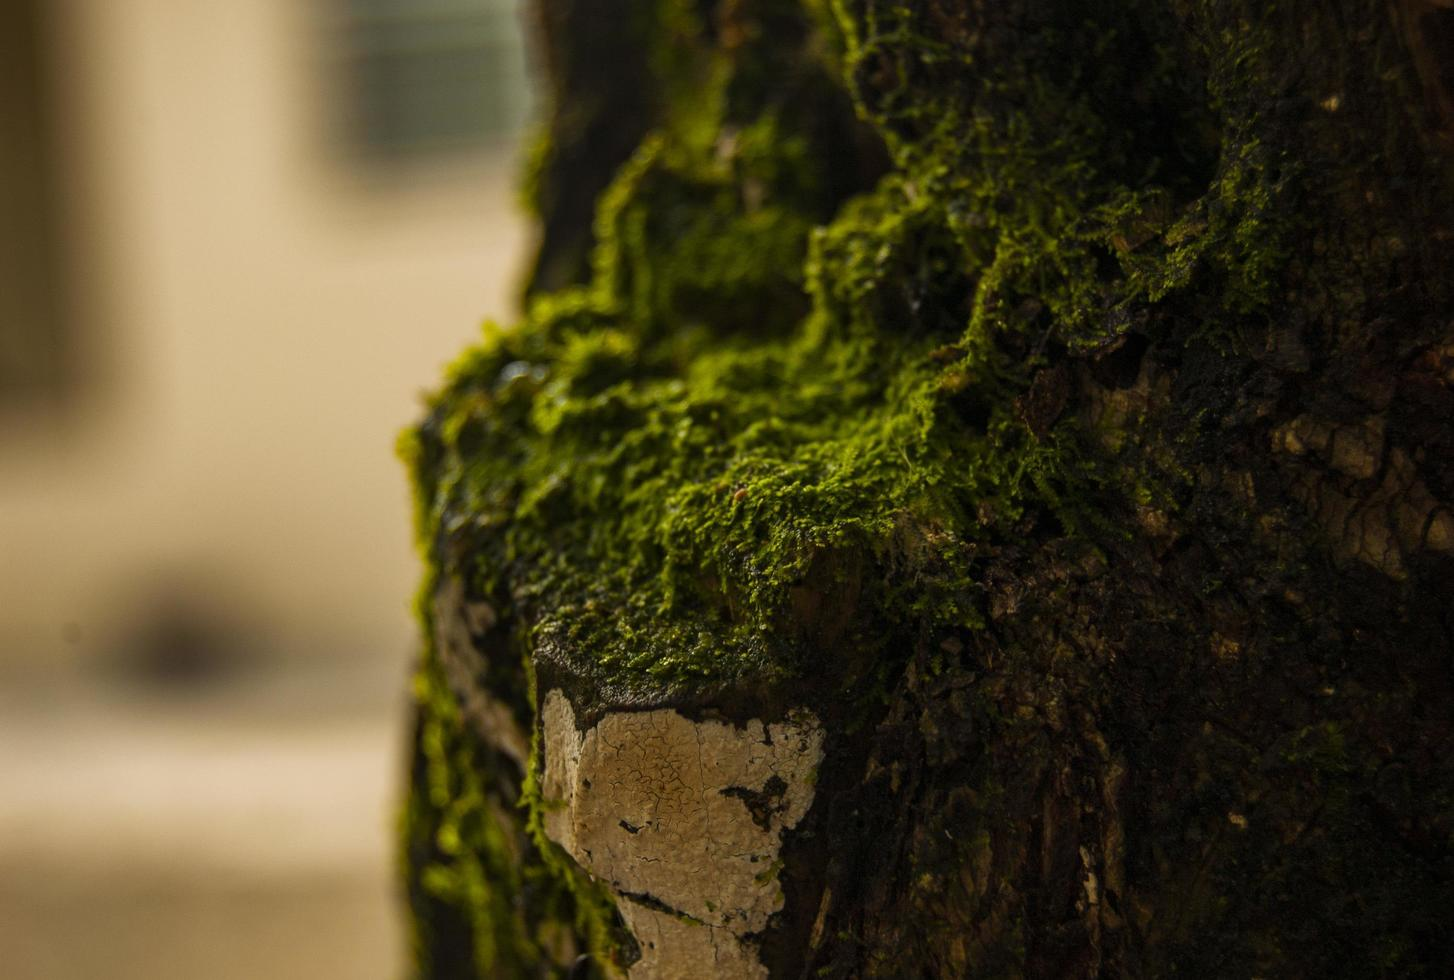 Green moss on tree photo